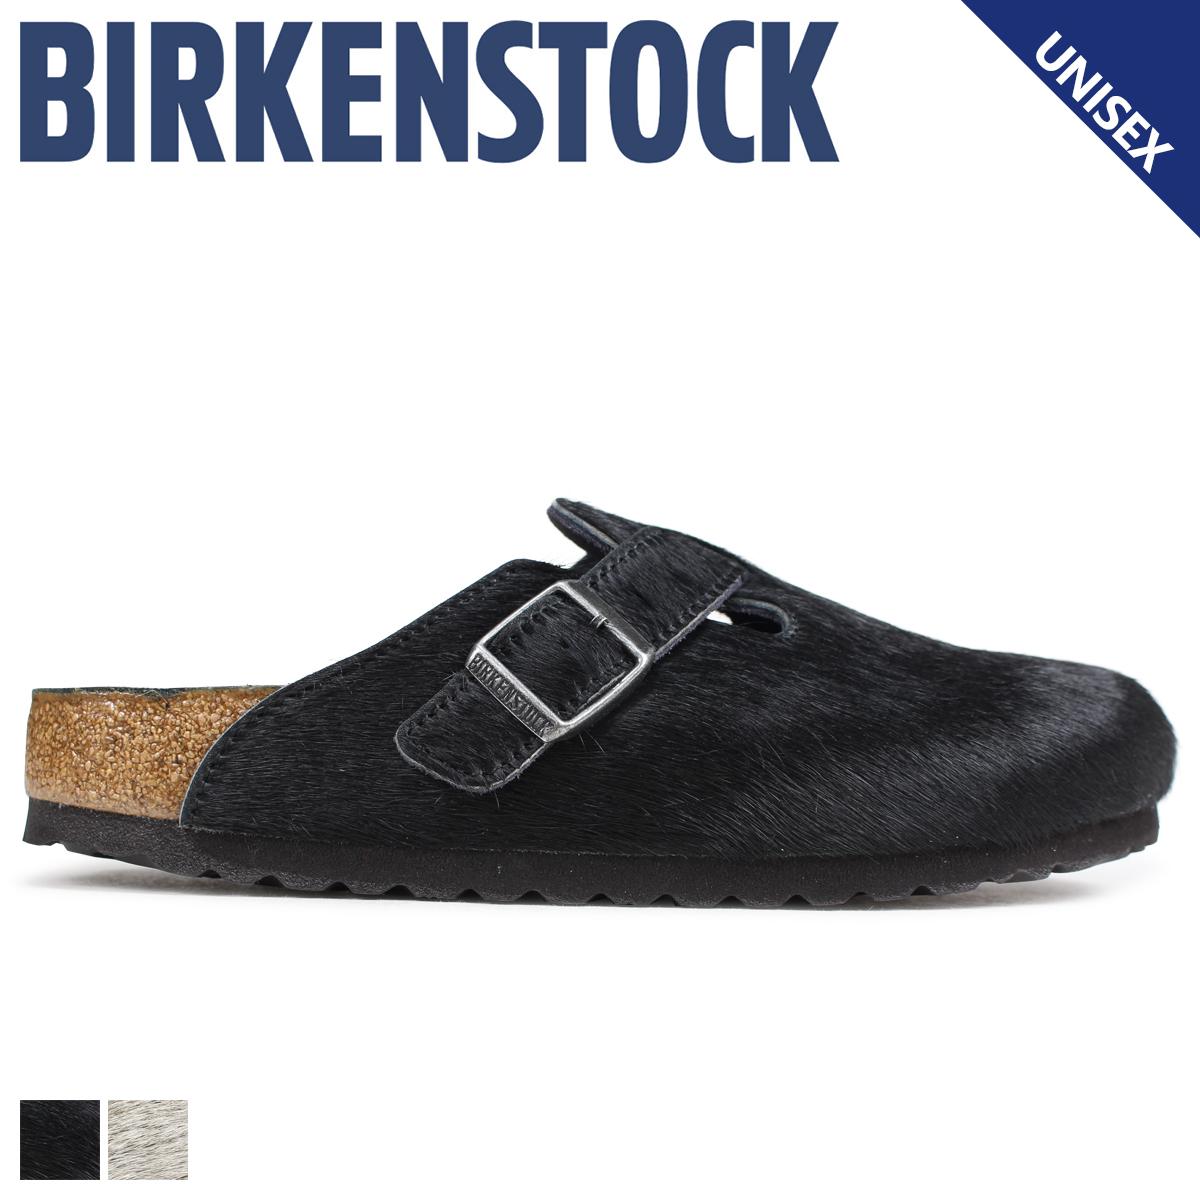 BIRKENSTOCK ボストン メンズ レディース ビルケンシュトック BOSTON ビルケン サンダル ファー 細幅 普通幅